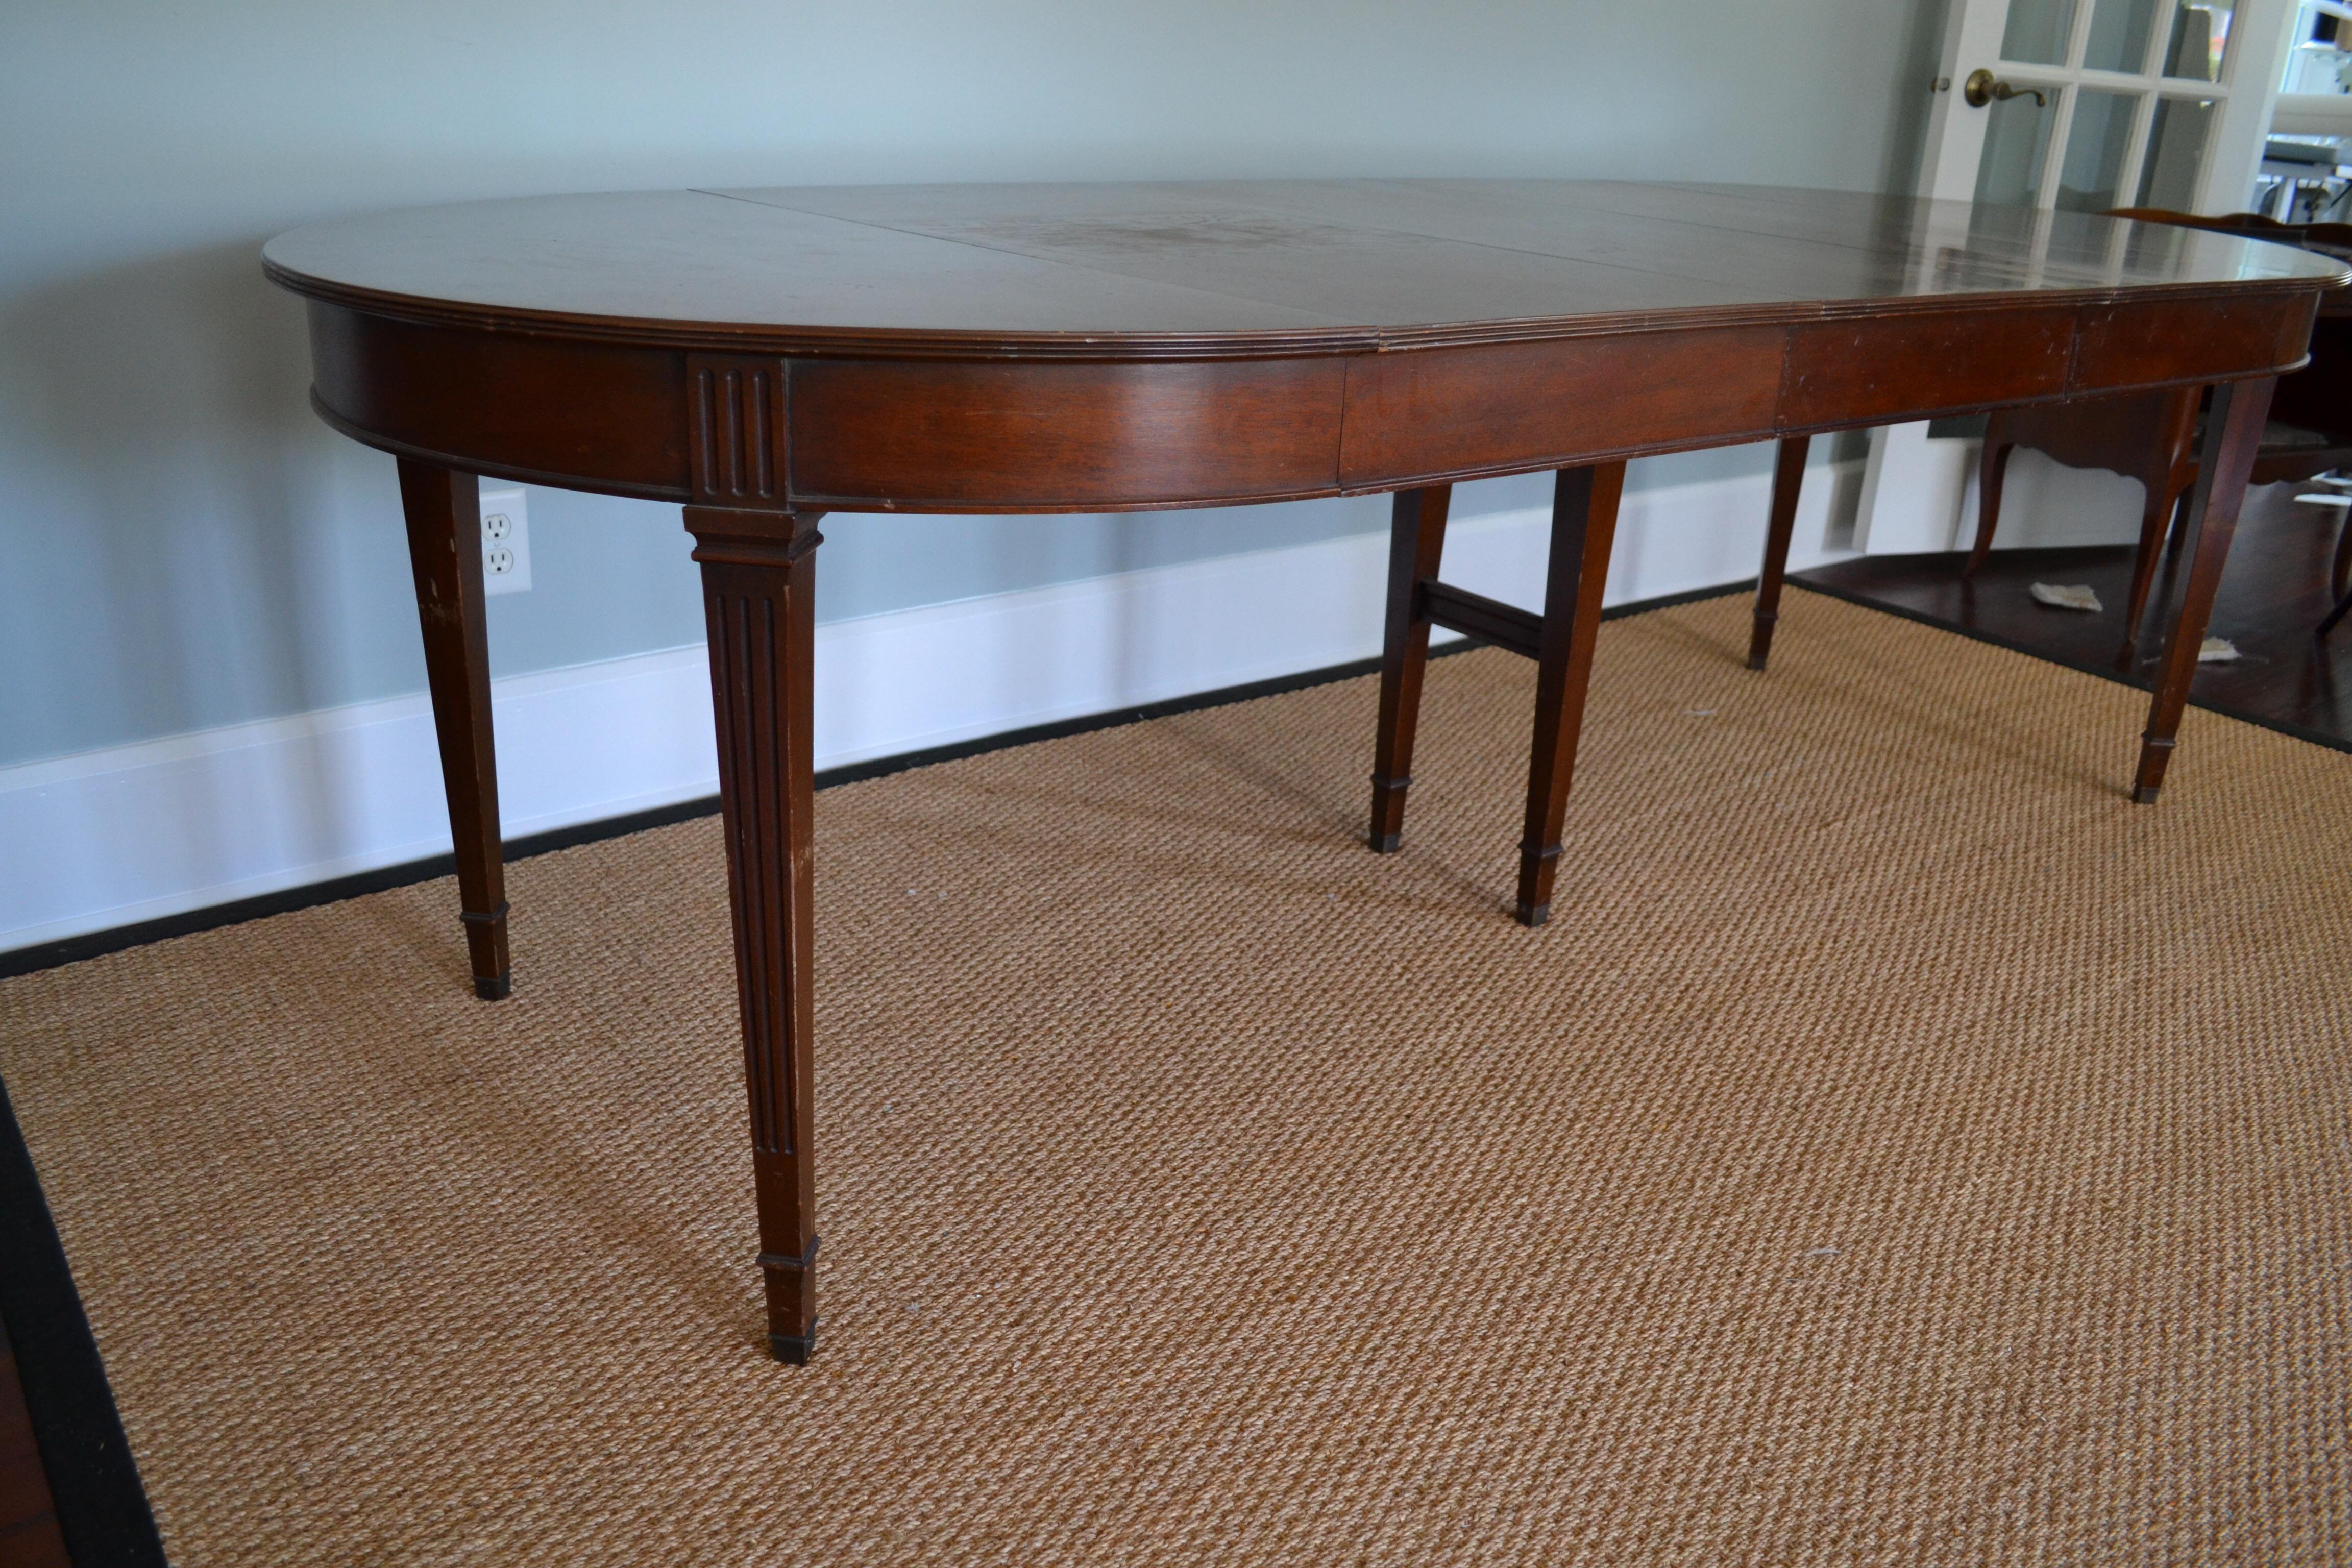 Henredon Mahogany Neoclassical Dining Table Chairish : 57670ba6 1475 4d56 9699 b8e7b45479b0aspectfitampwidth640ampheight640 from www.chairish.com size 640 x 640 jpeg 57kB